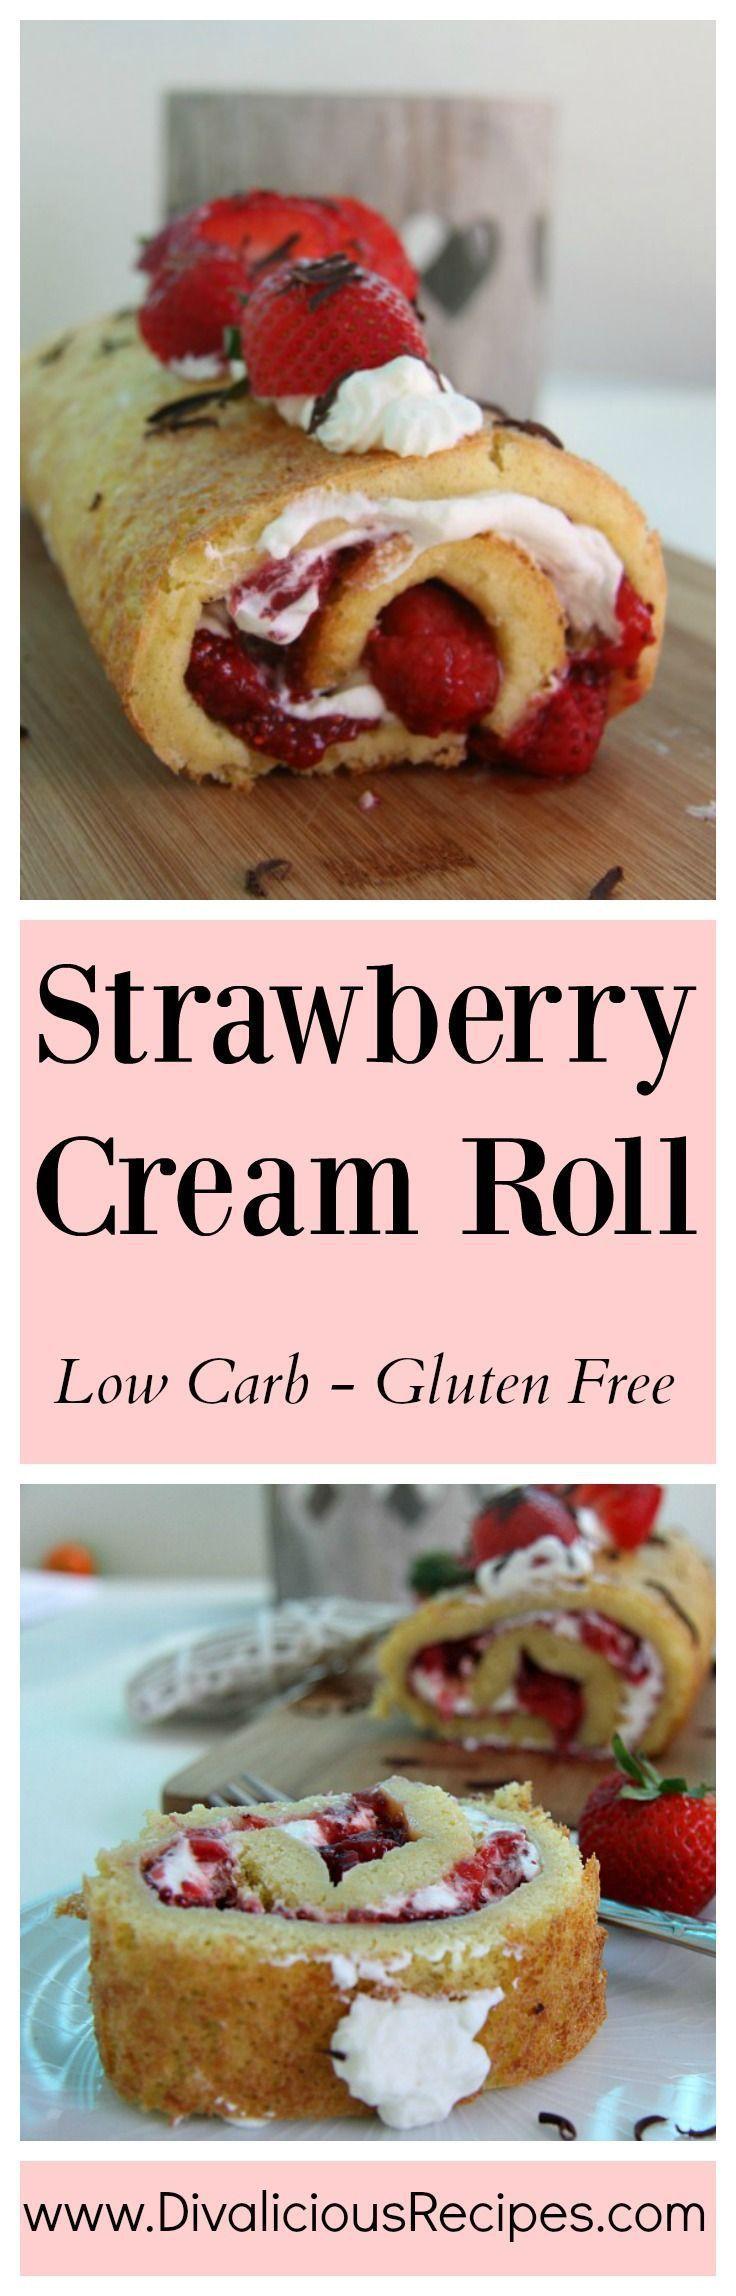 Strawberry cream roll